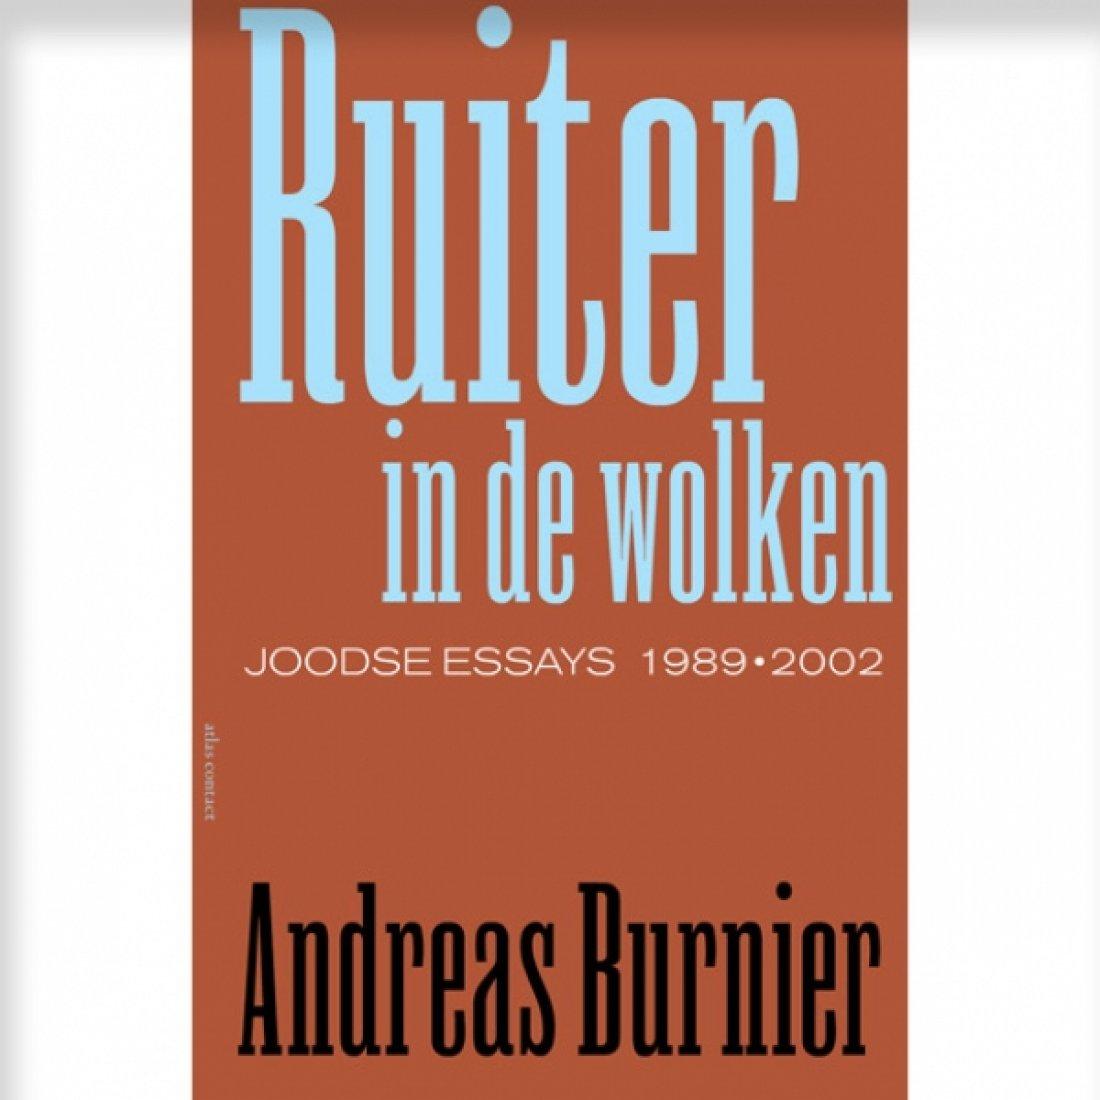 Essays van Andreas Burnier 2015